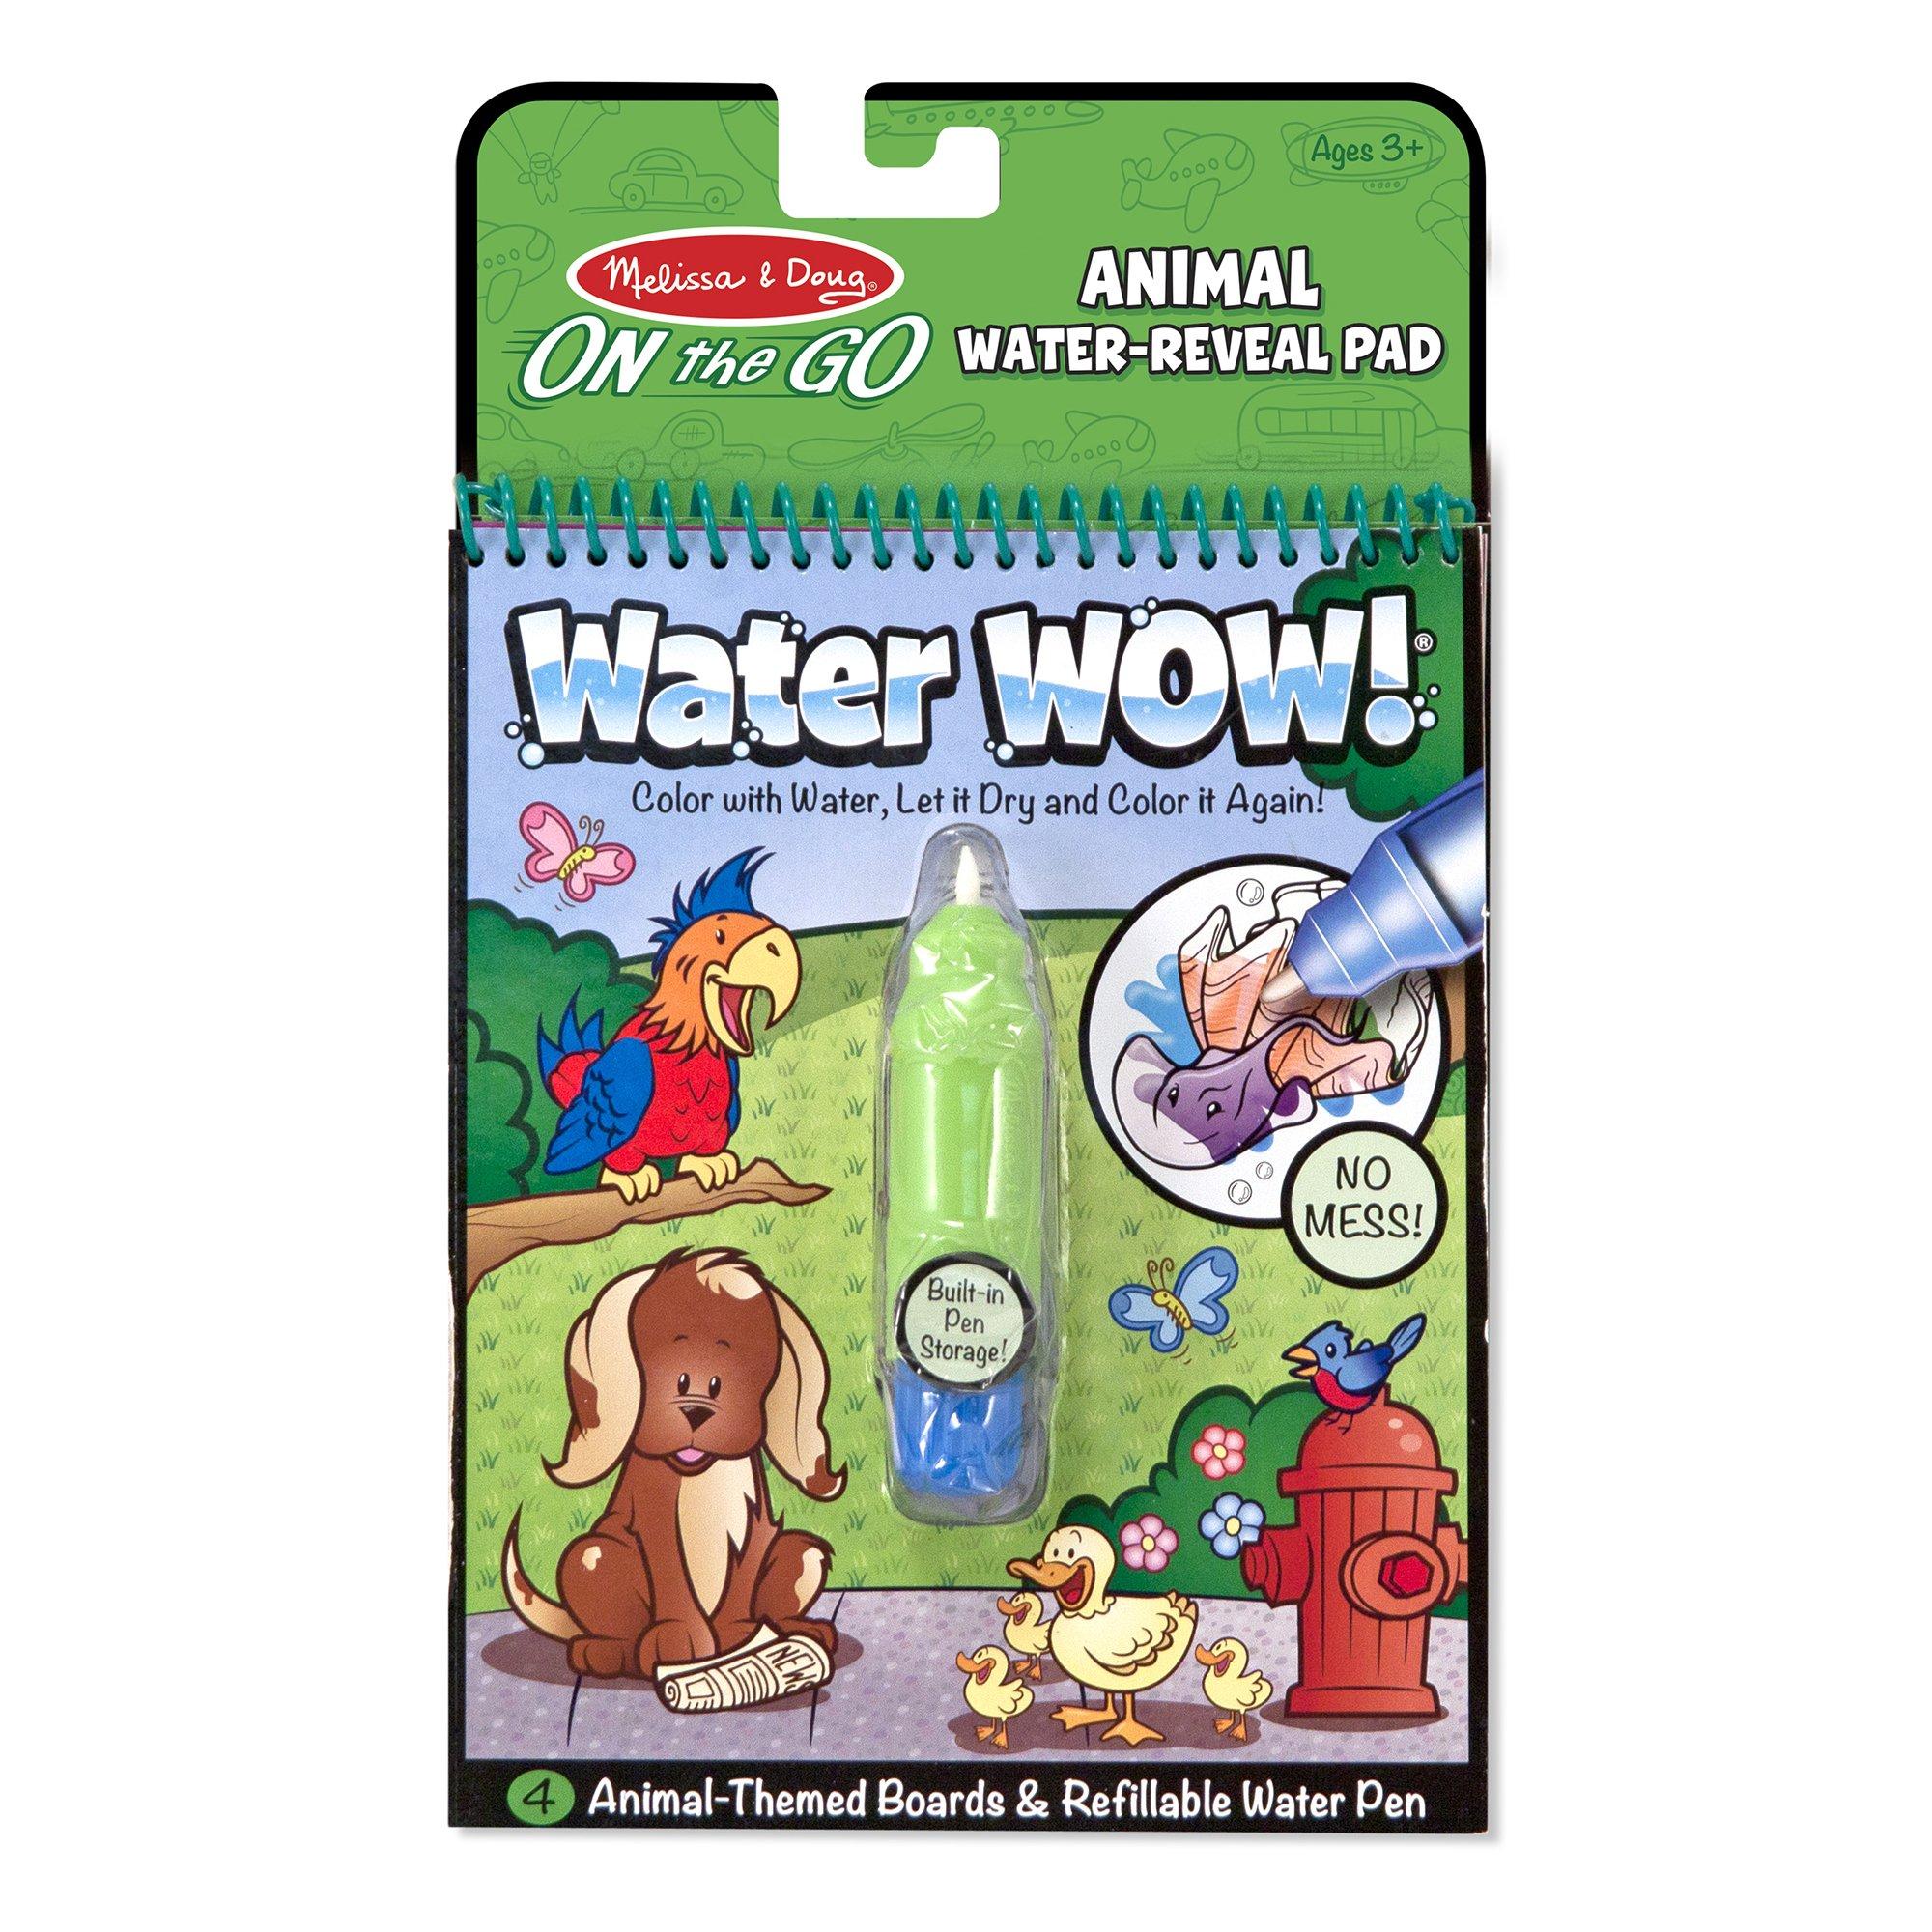 WATER WOW, ANIMALS